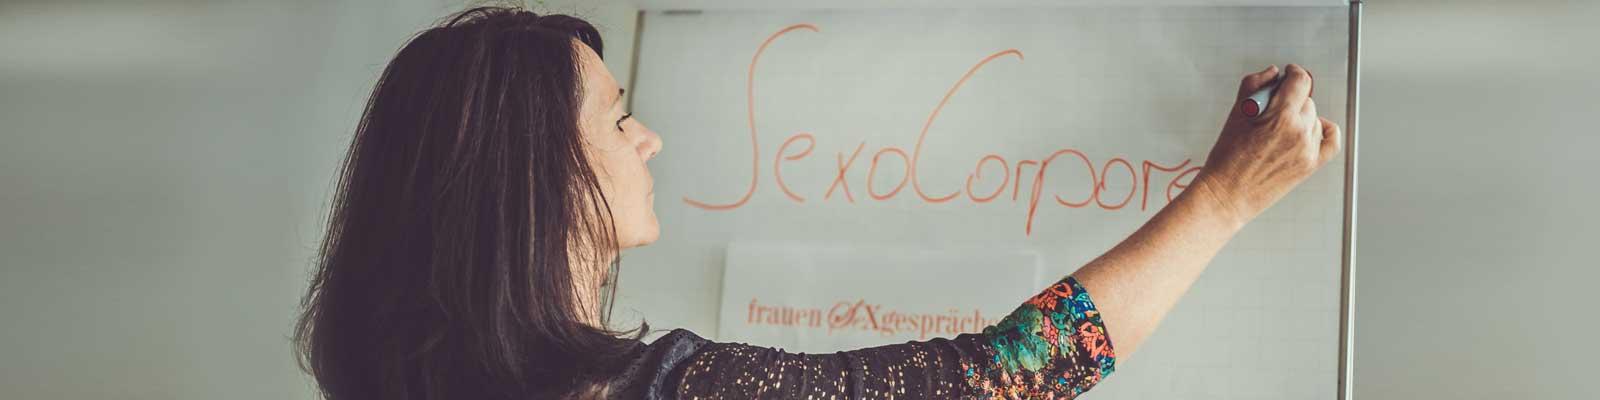 Sexologische Beratung Burgenland, Wien, Steiermark